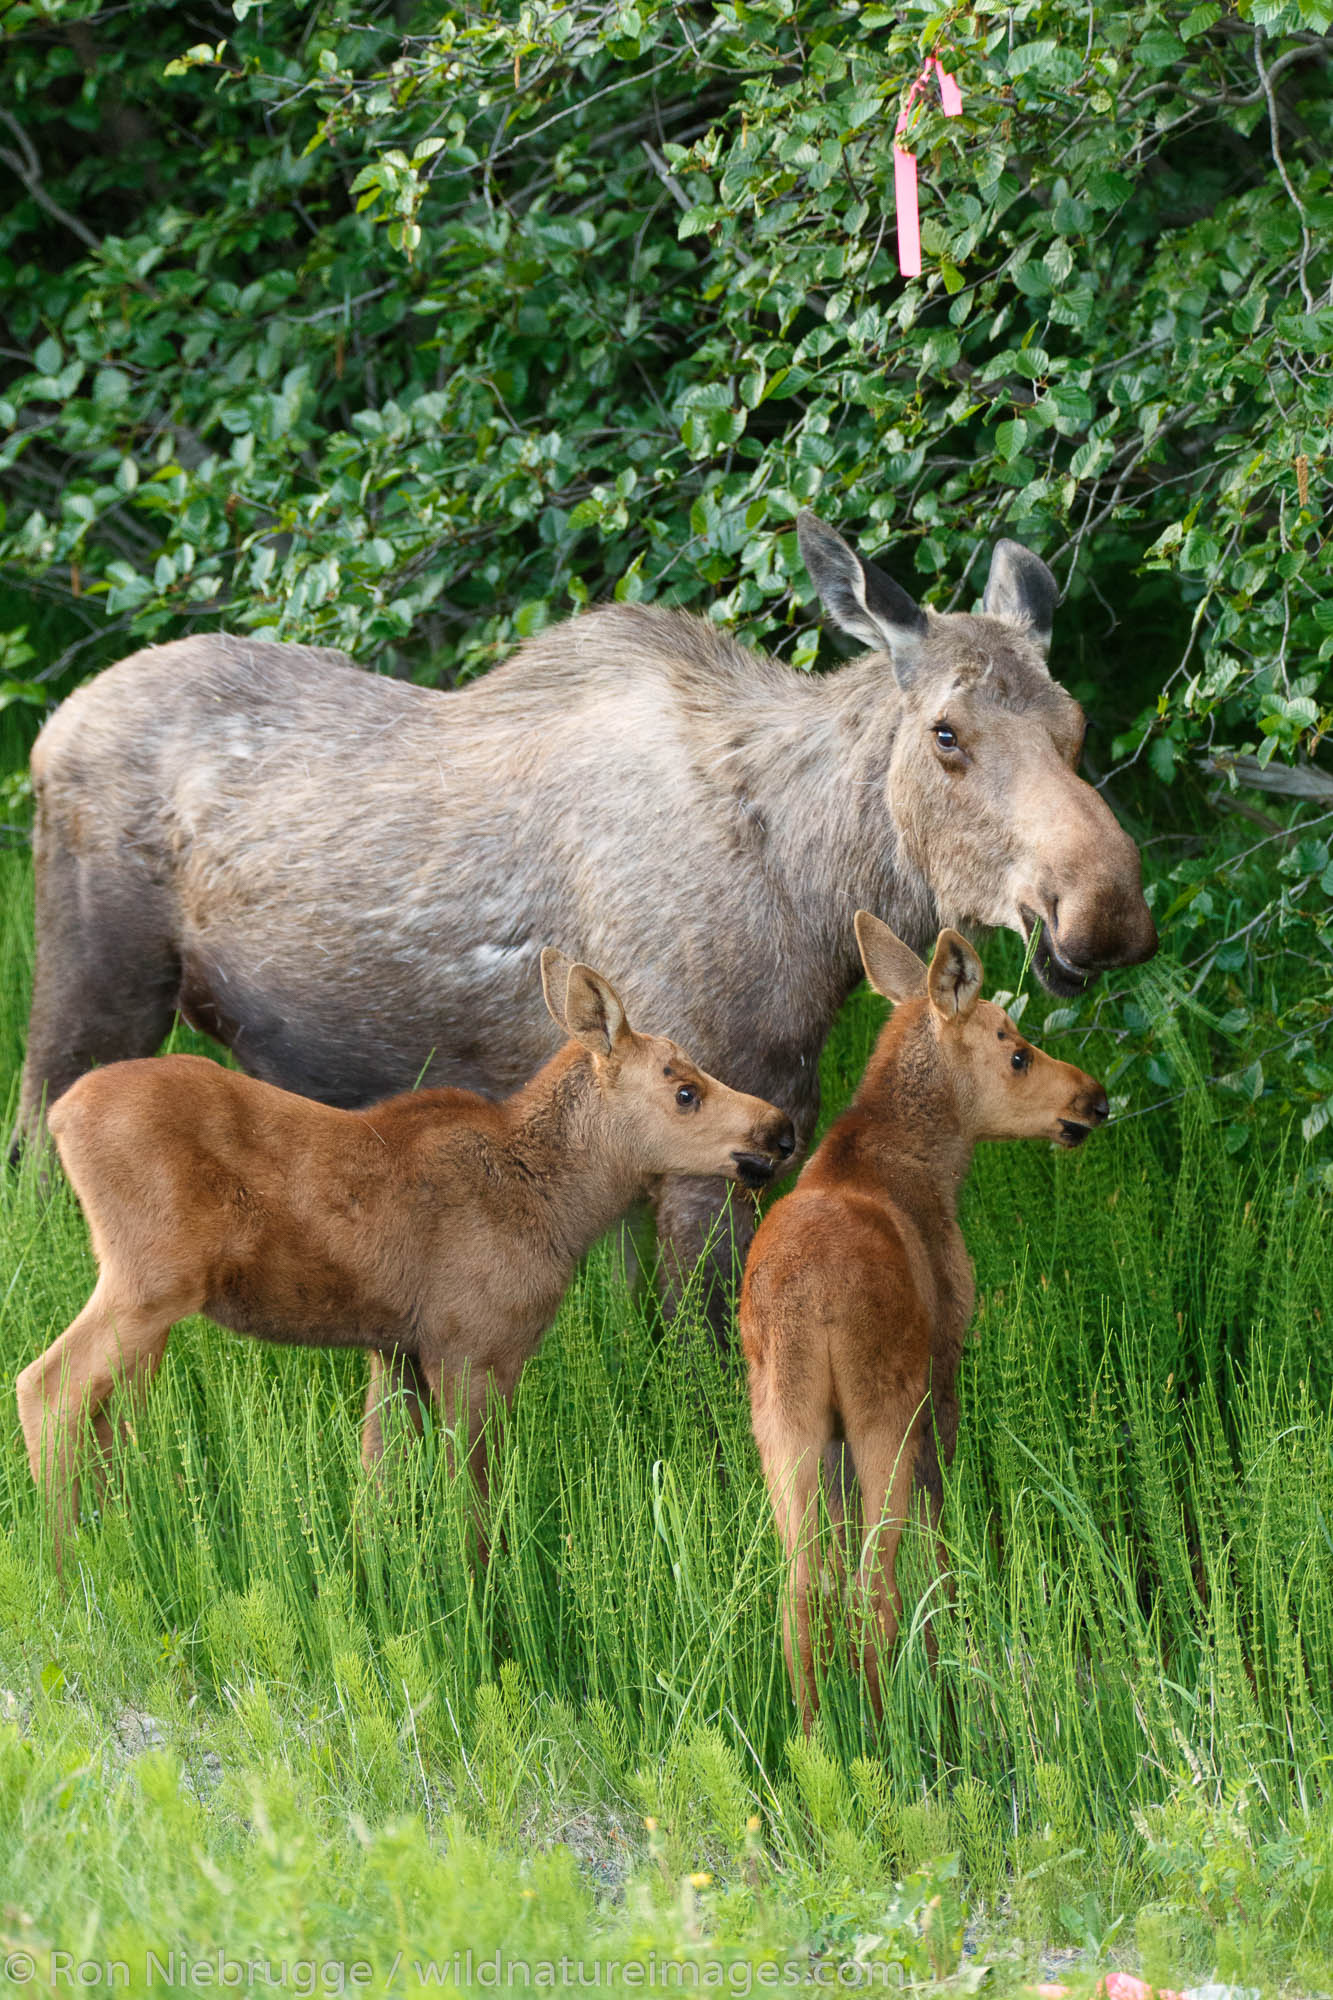 Cow and calf moose along Turnagain Arm, Chugach National Forest, Alaska.